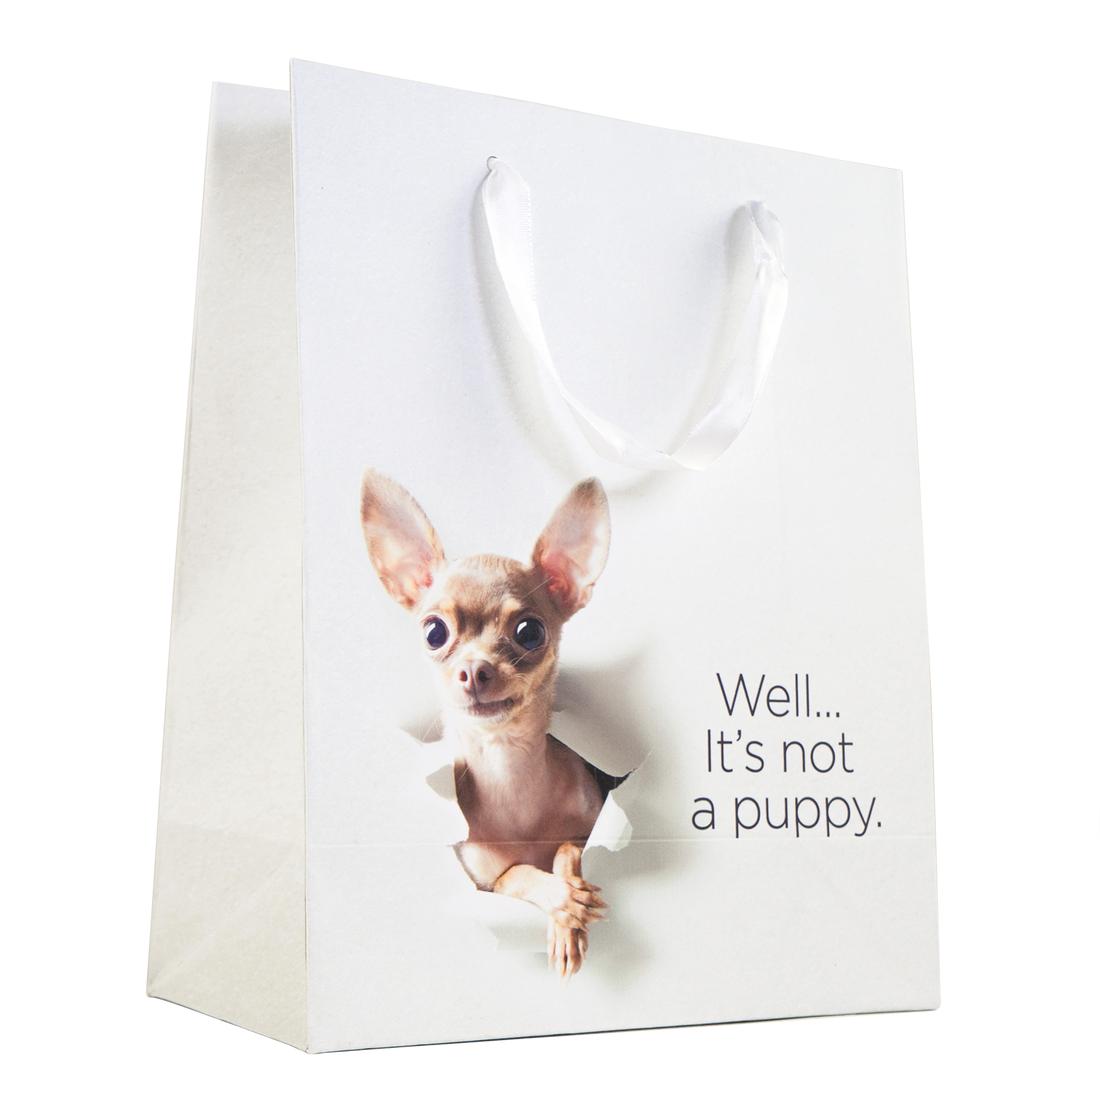 30 Watt Funny Gift Bag: Not a Puppy